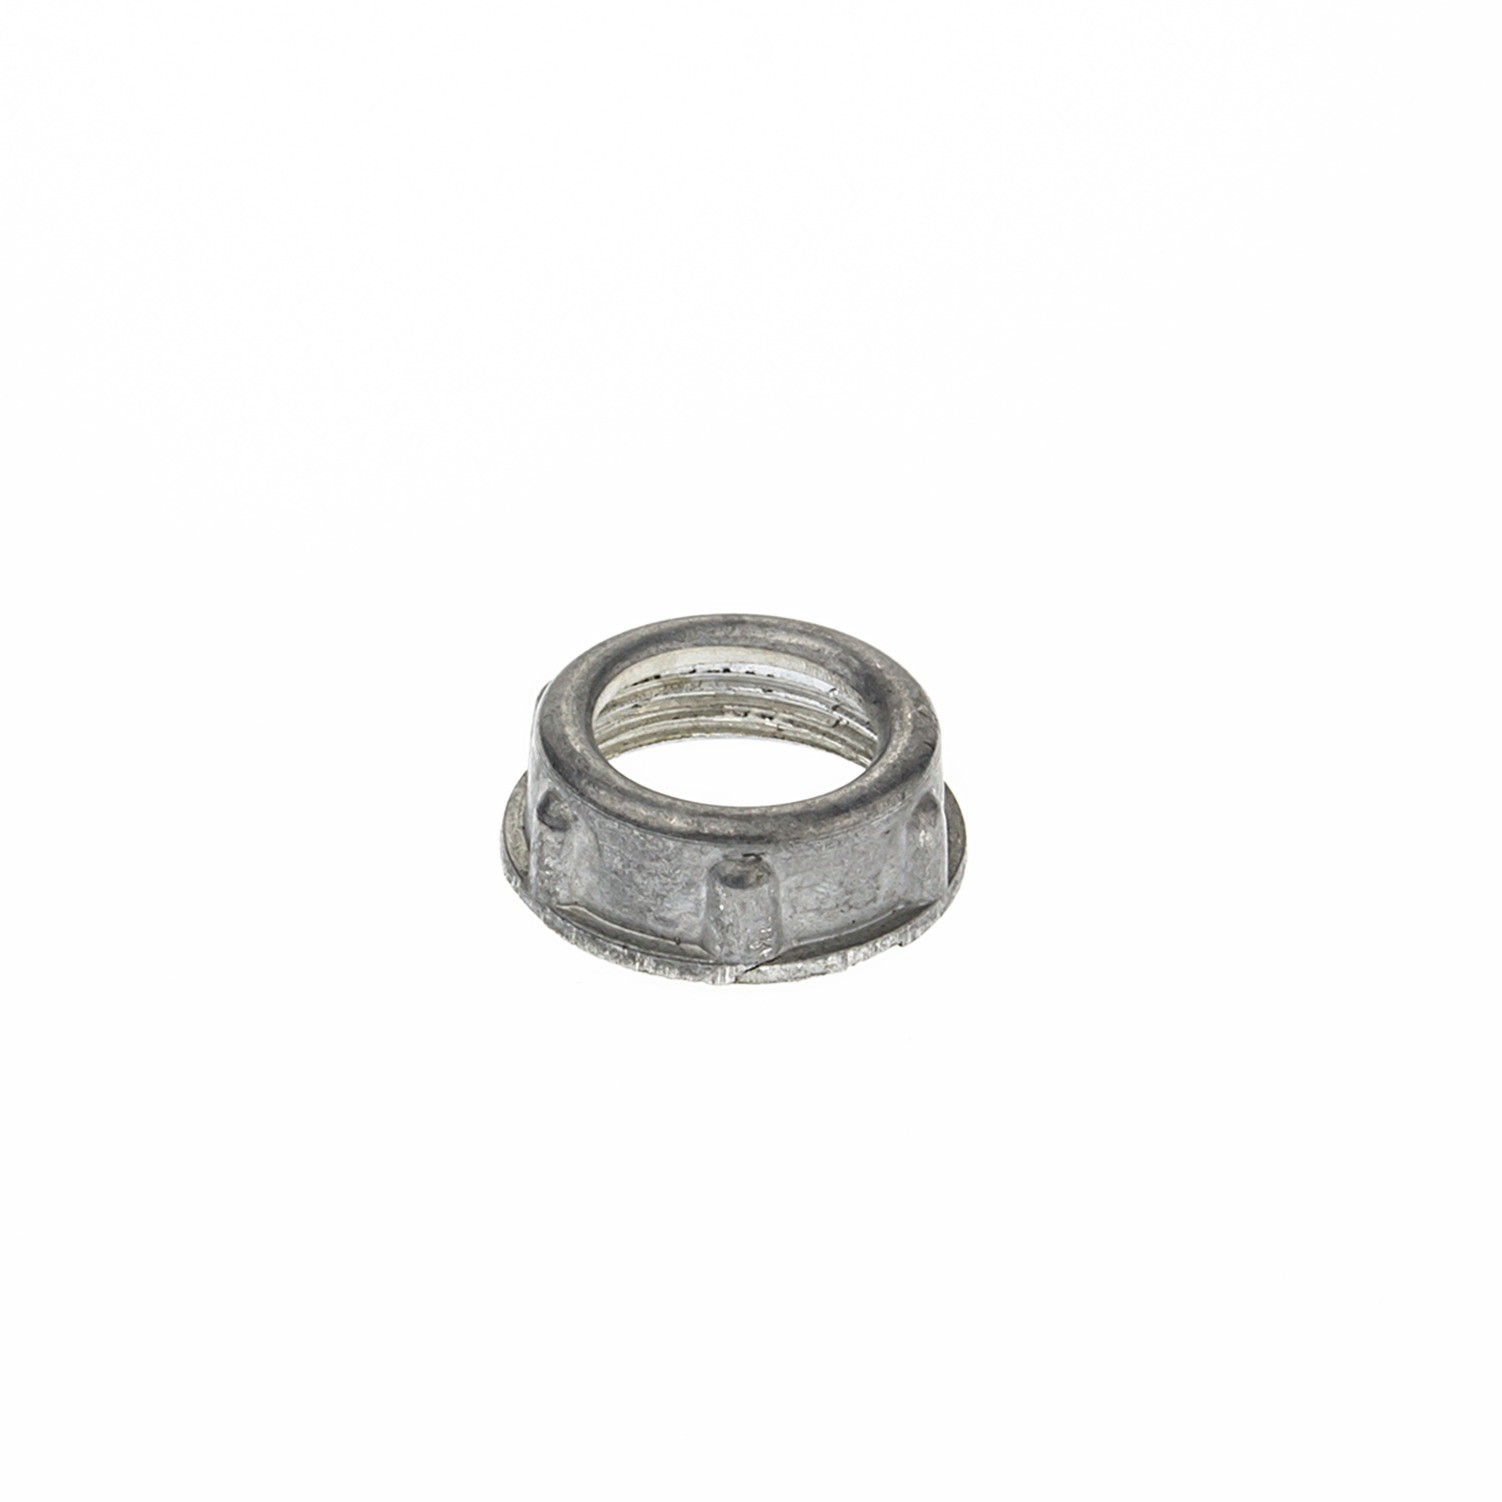 Bucha Roscavel 112 Aluminio Cinza - Mavel